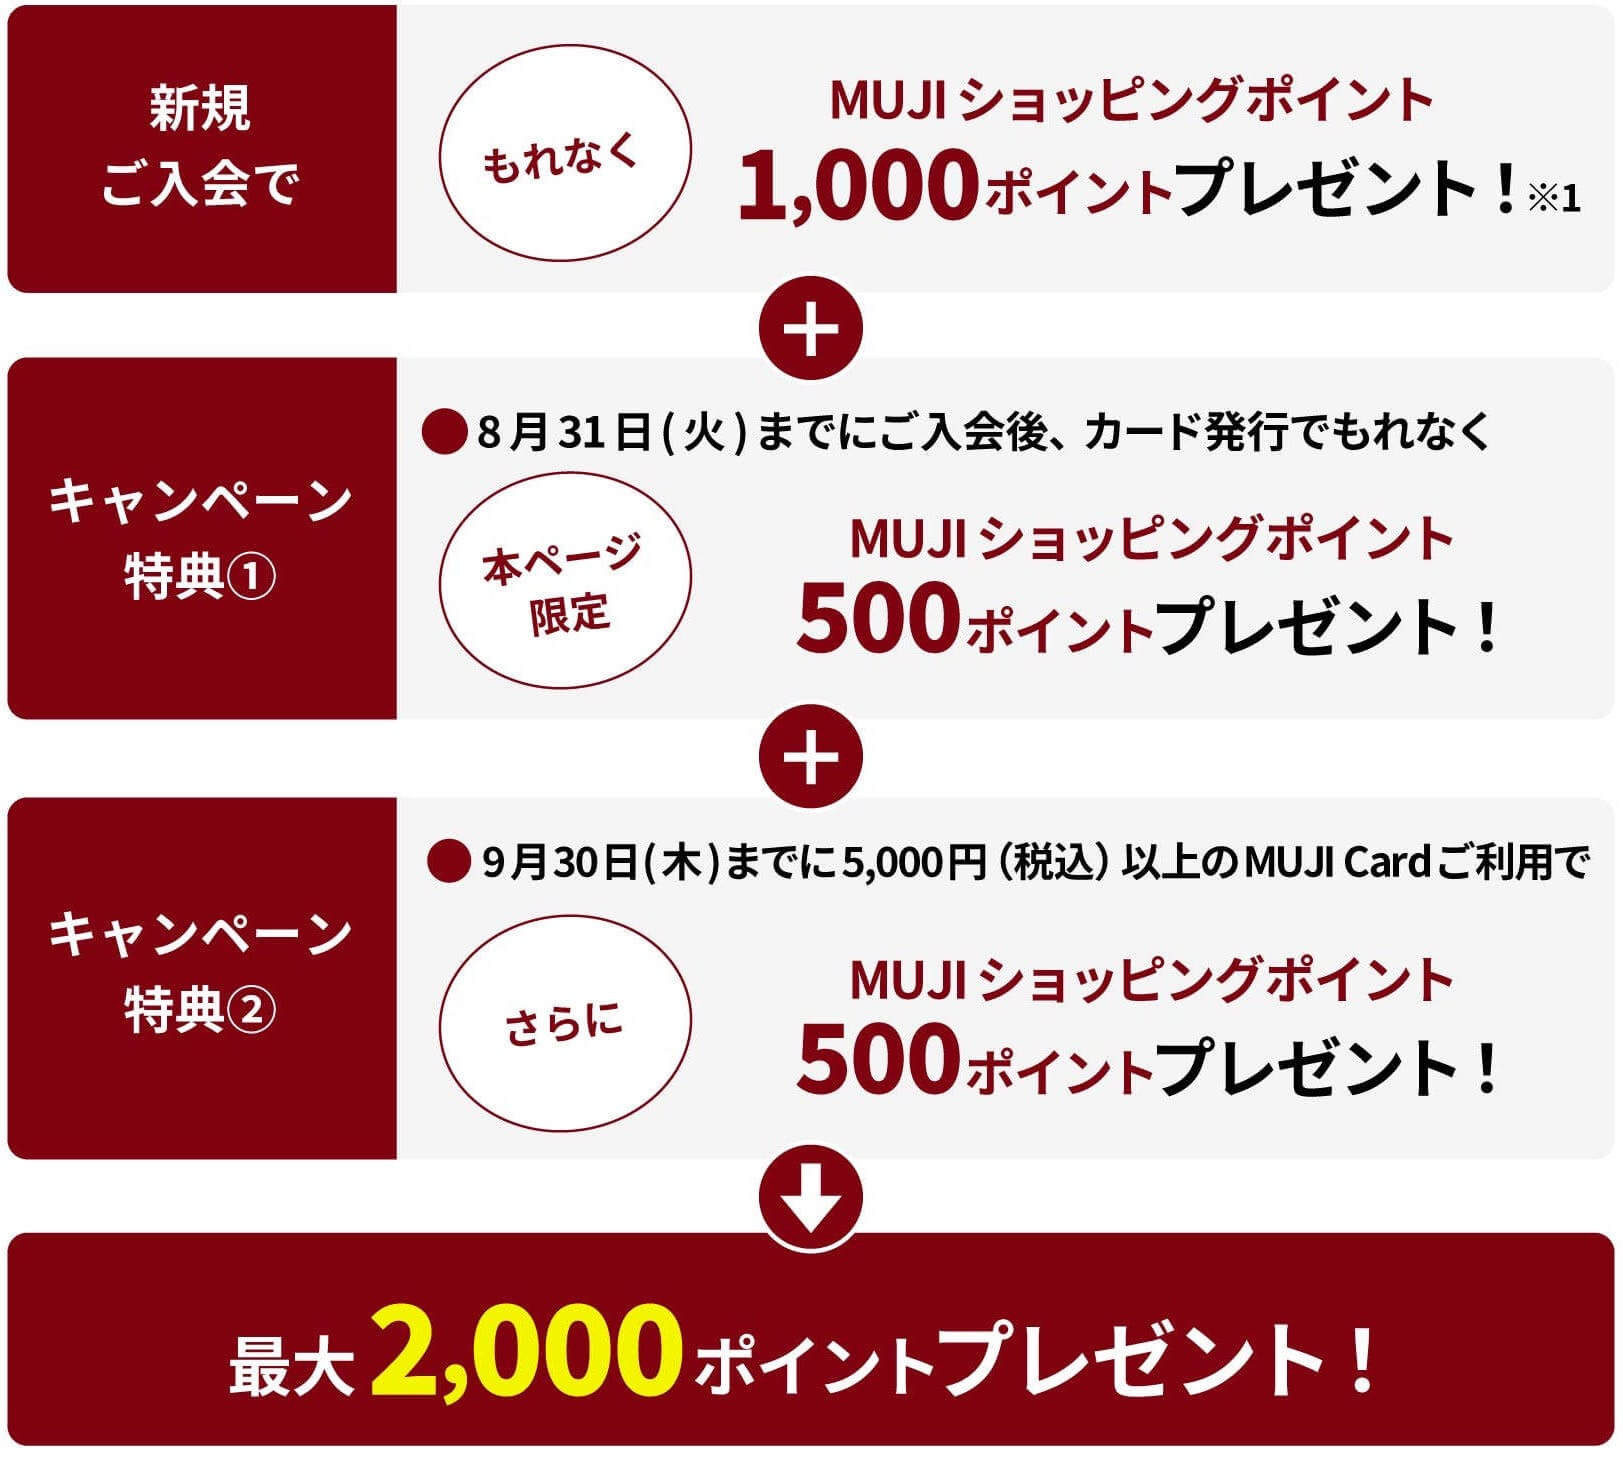 MUJIカード新規入会キャンペーン